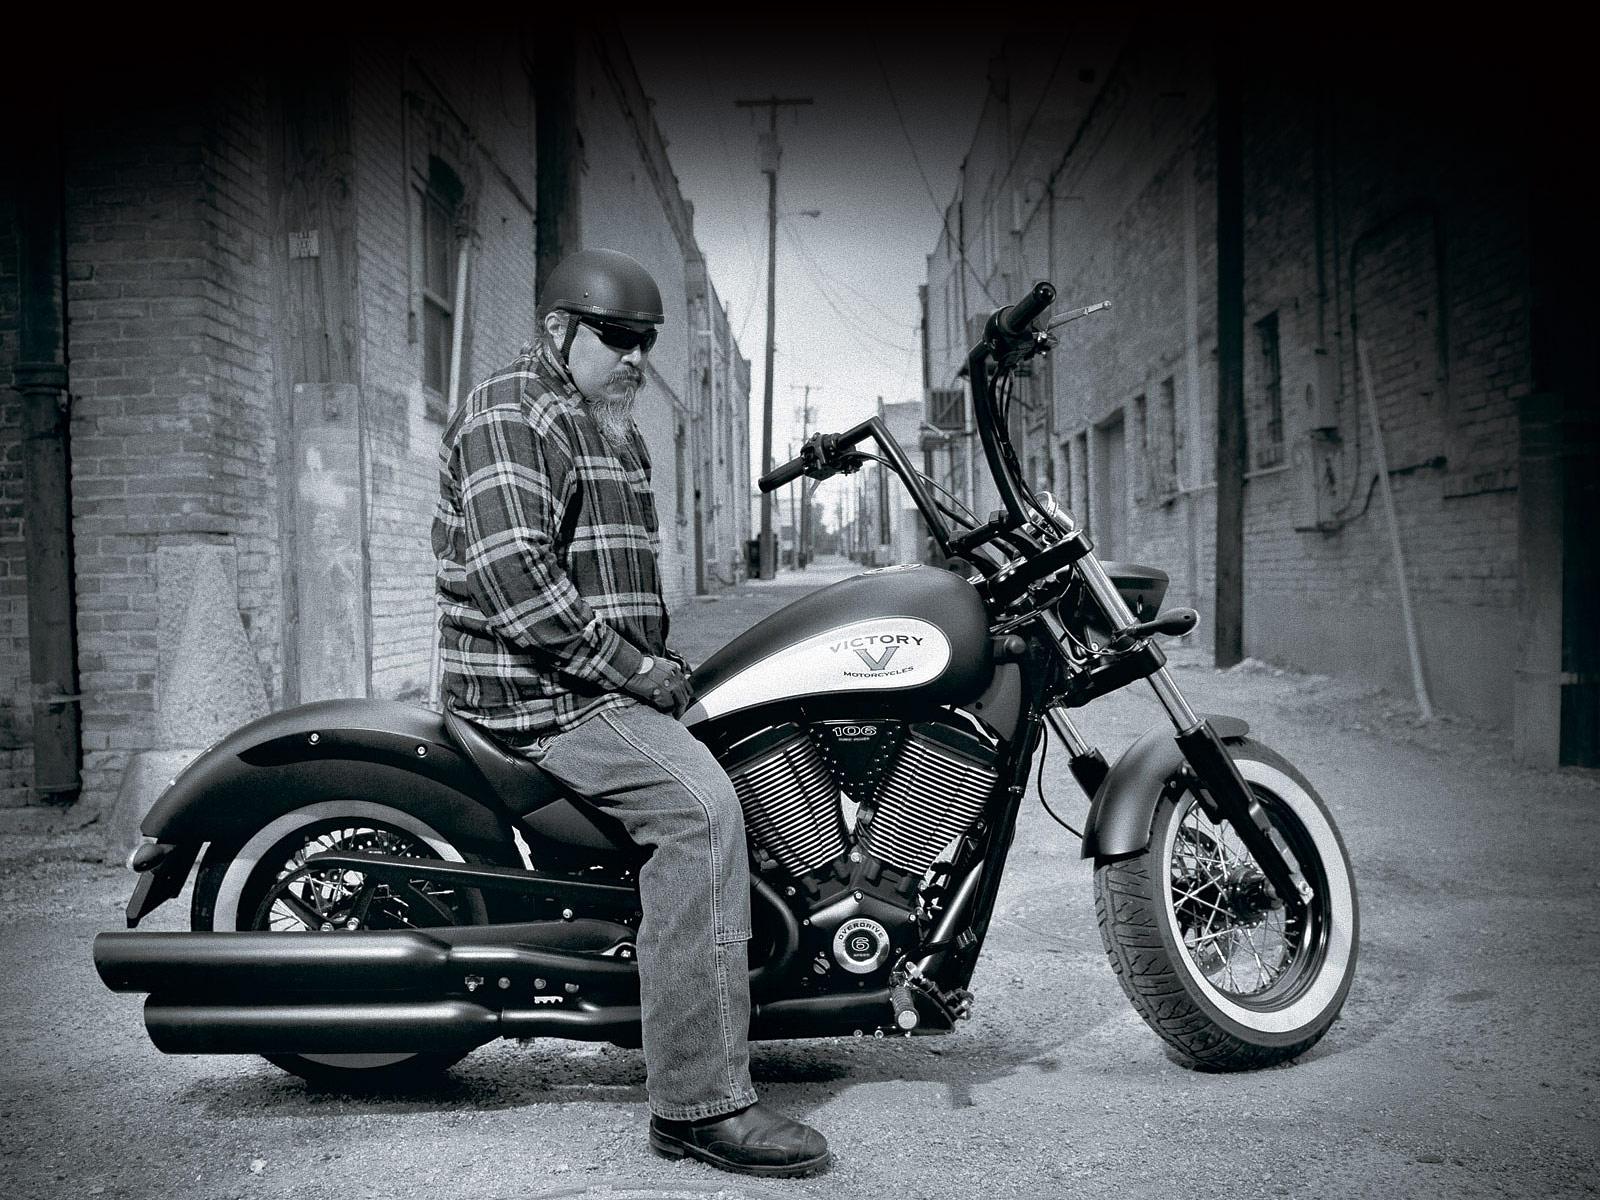 2012 VICTORY High Ball Motorcycle Desktop Wallpaper 1600x1200